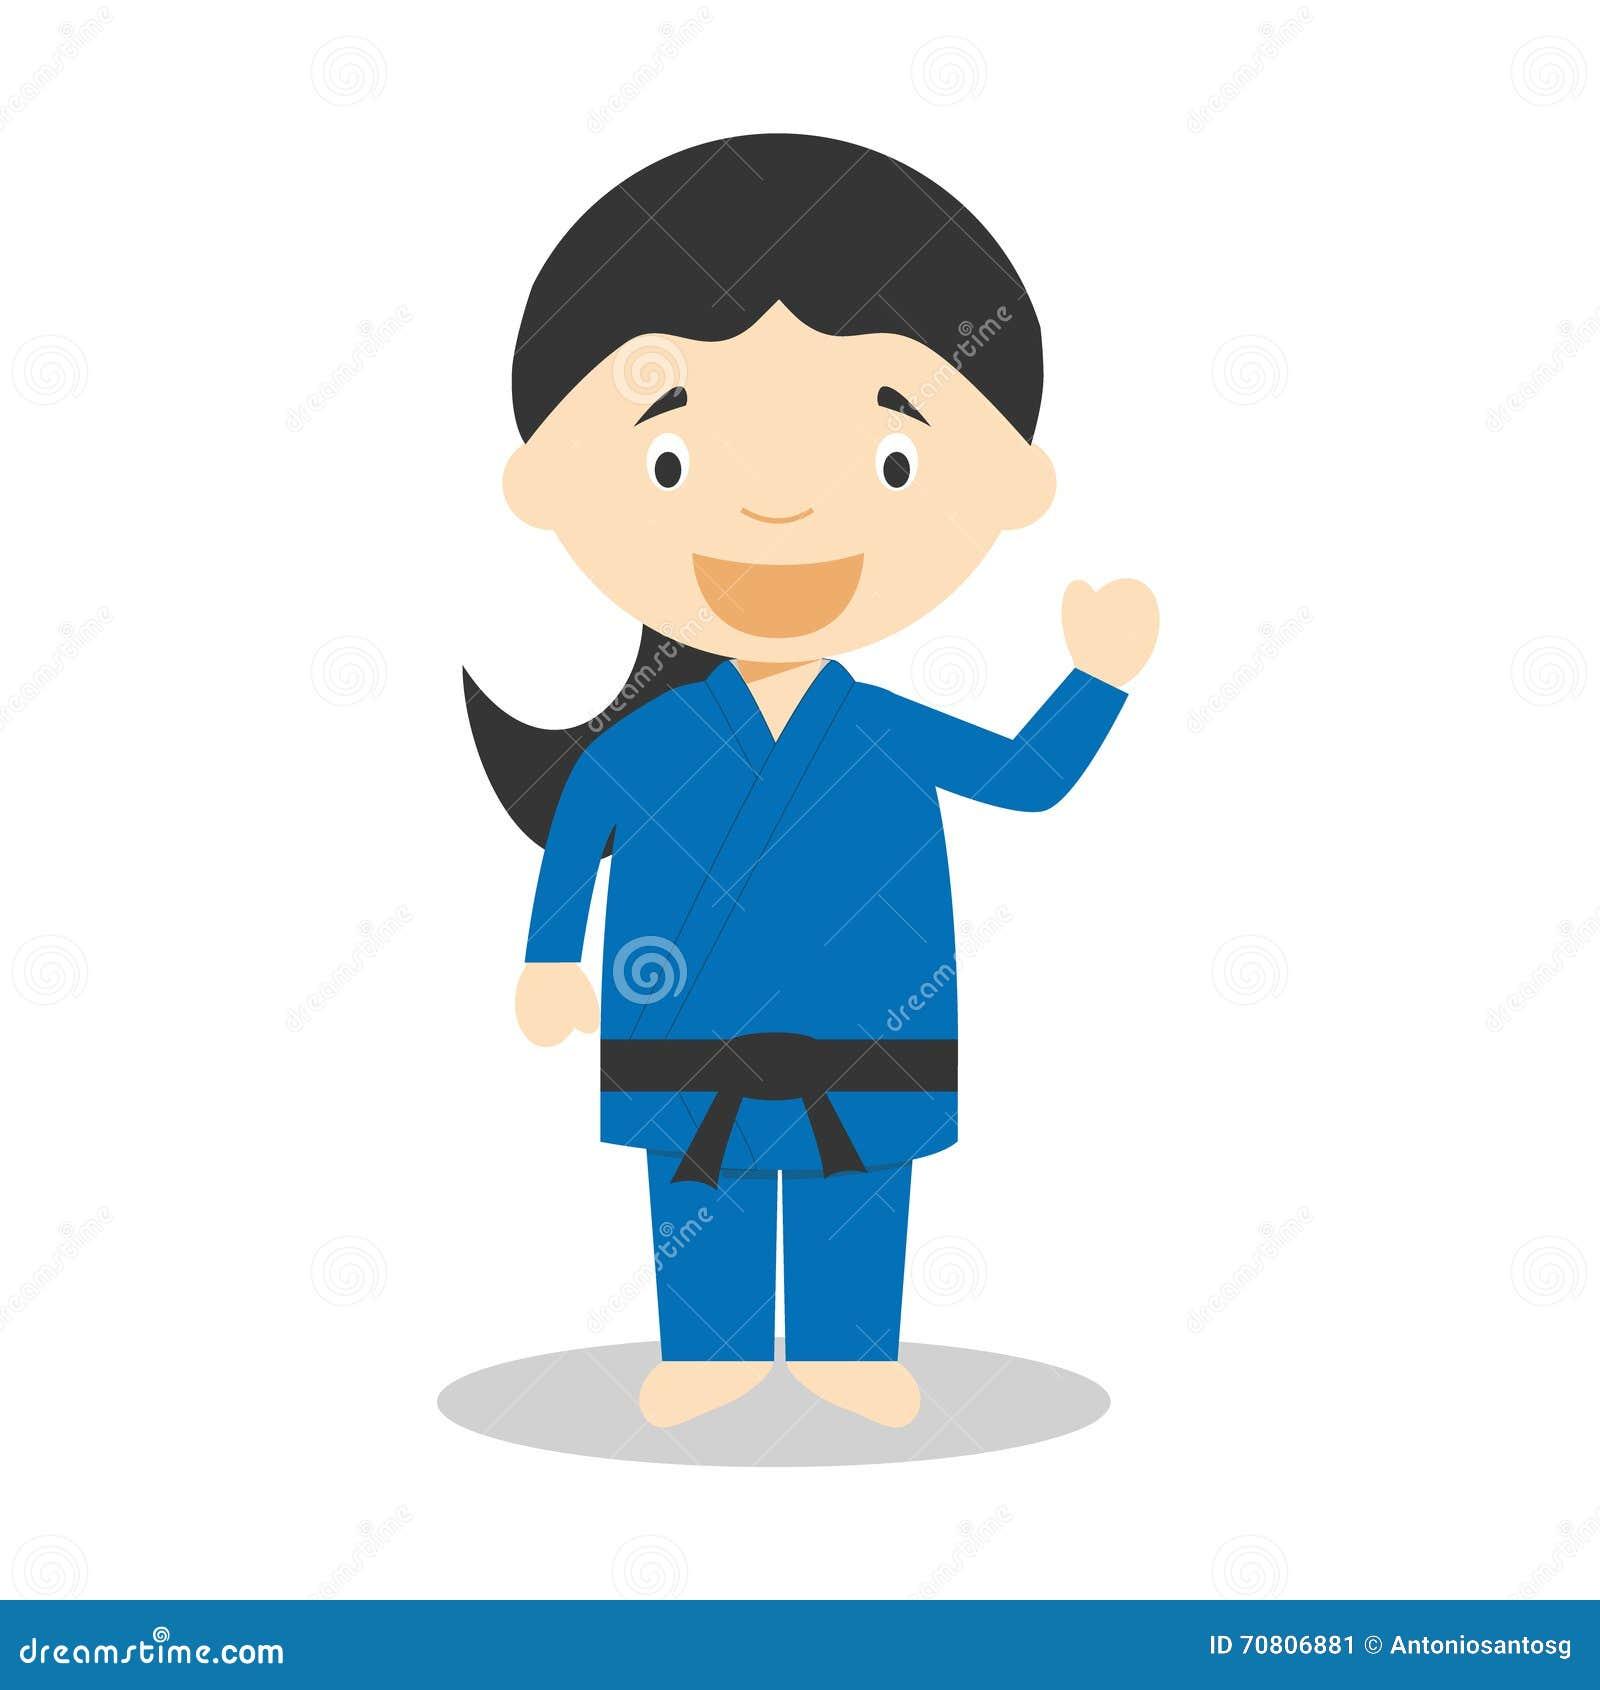 Kimono for karate. How to choose and buy 77